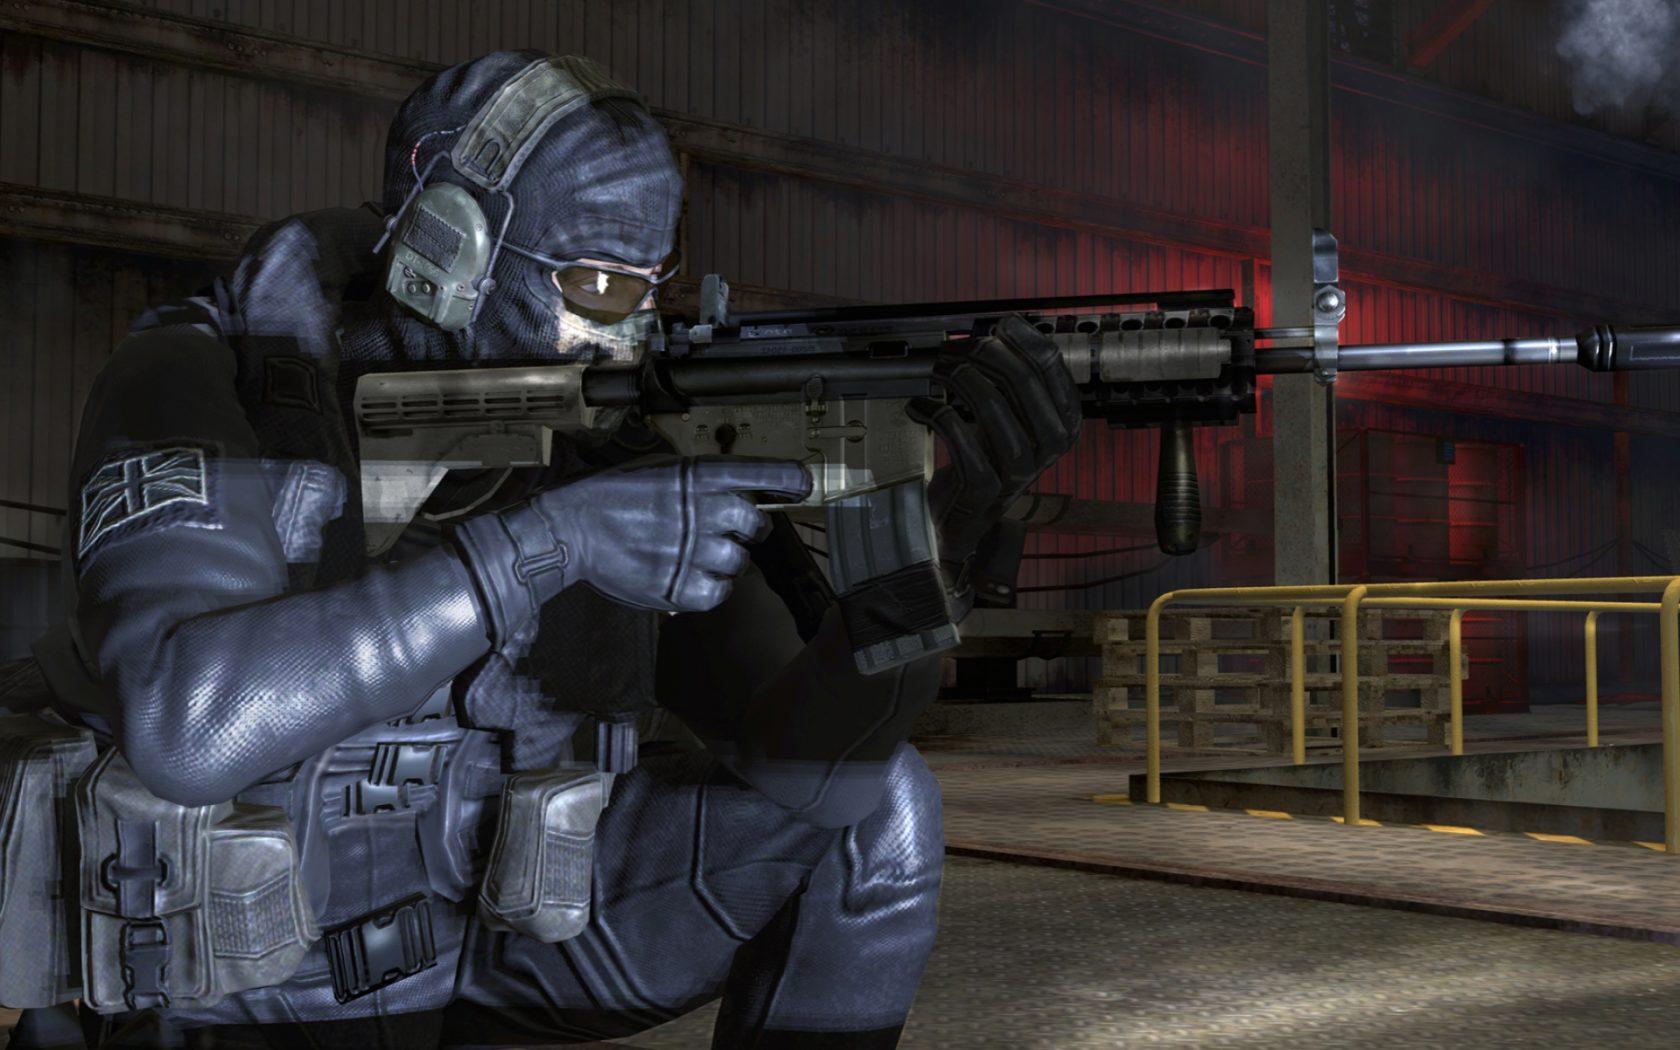 Call of Duty: Modern Warfare 2 [Mobile] - IGN